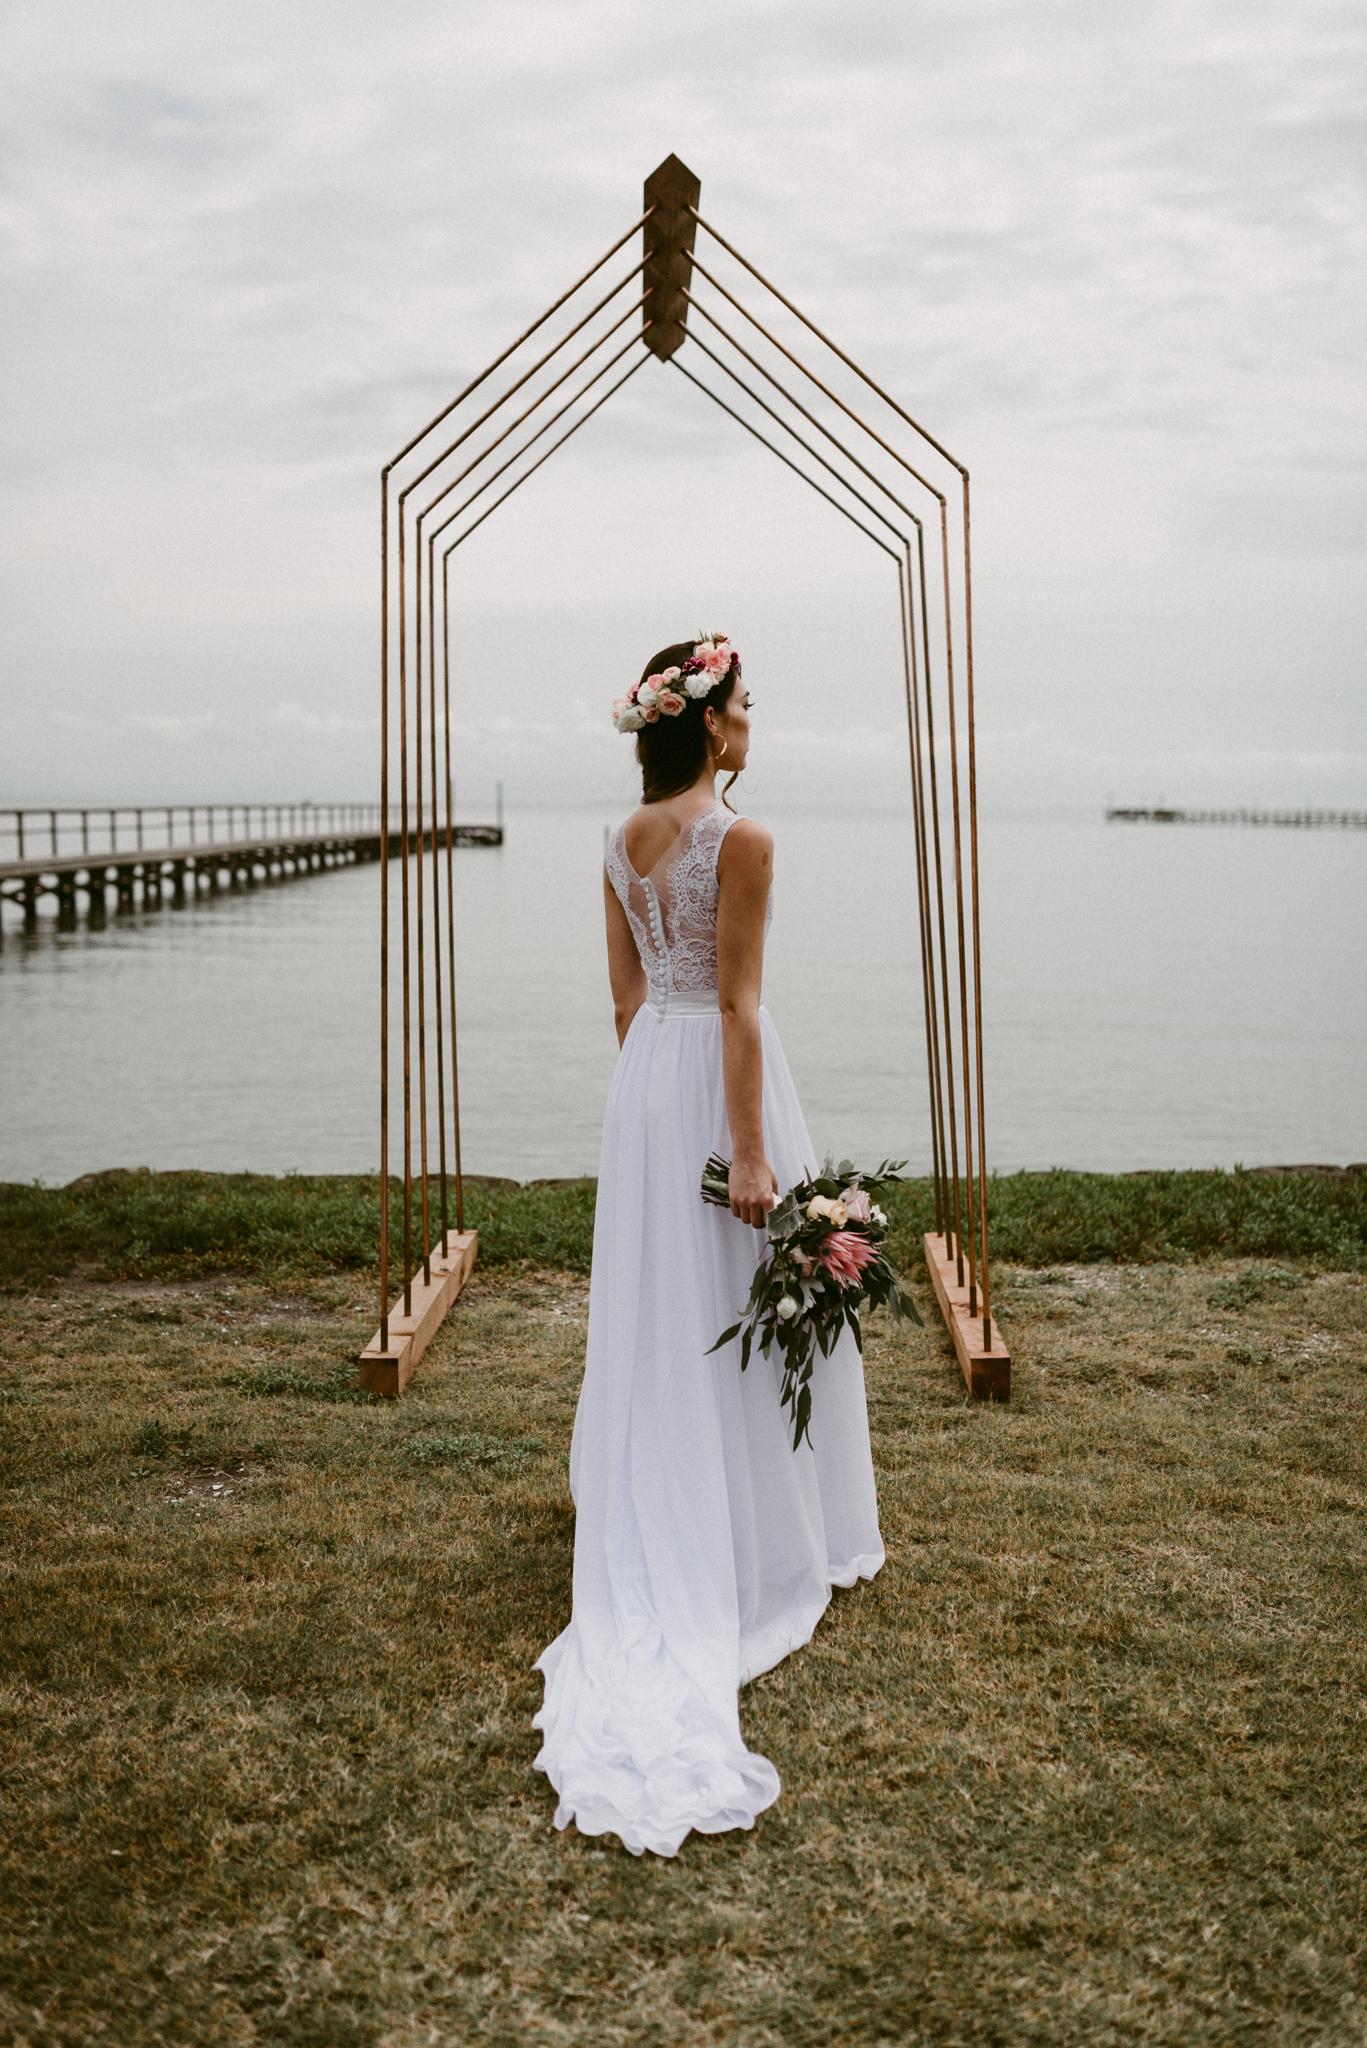 Boho-Sunrise-Rockport-by-the-Sea-Wedding-Kerlyn-Van-Gelder-Photography-Corpus-Christi-Photographer